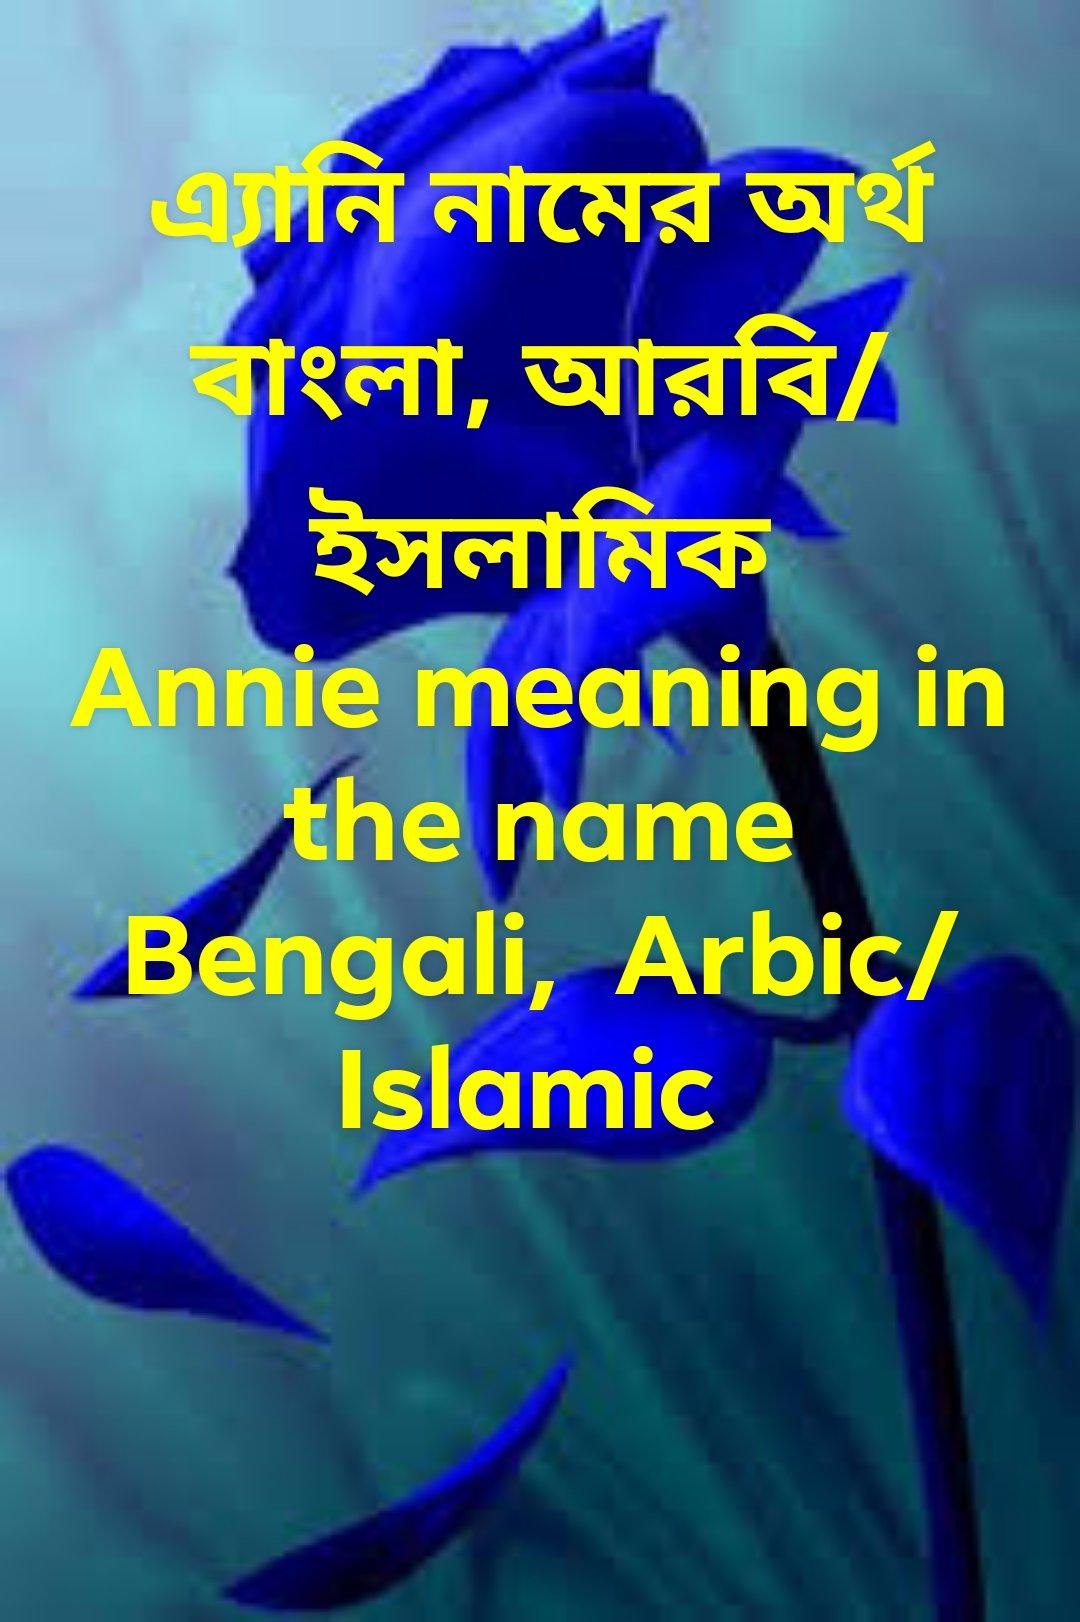 Annie name meaning in Bengali,  এ্যানি নামের অর্থ কি, এ্যানি নামের বাংলা অর্থ কি, এ্যানি নামের ইসলামিক অর্থ কি, এ্যানি কি ইসলামিক/ আরবি নাম